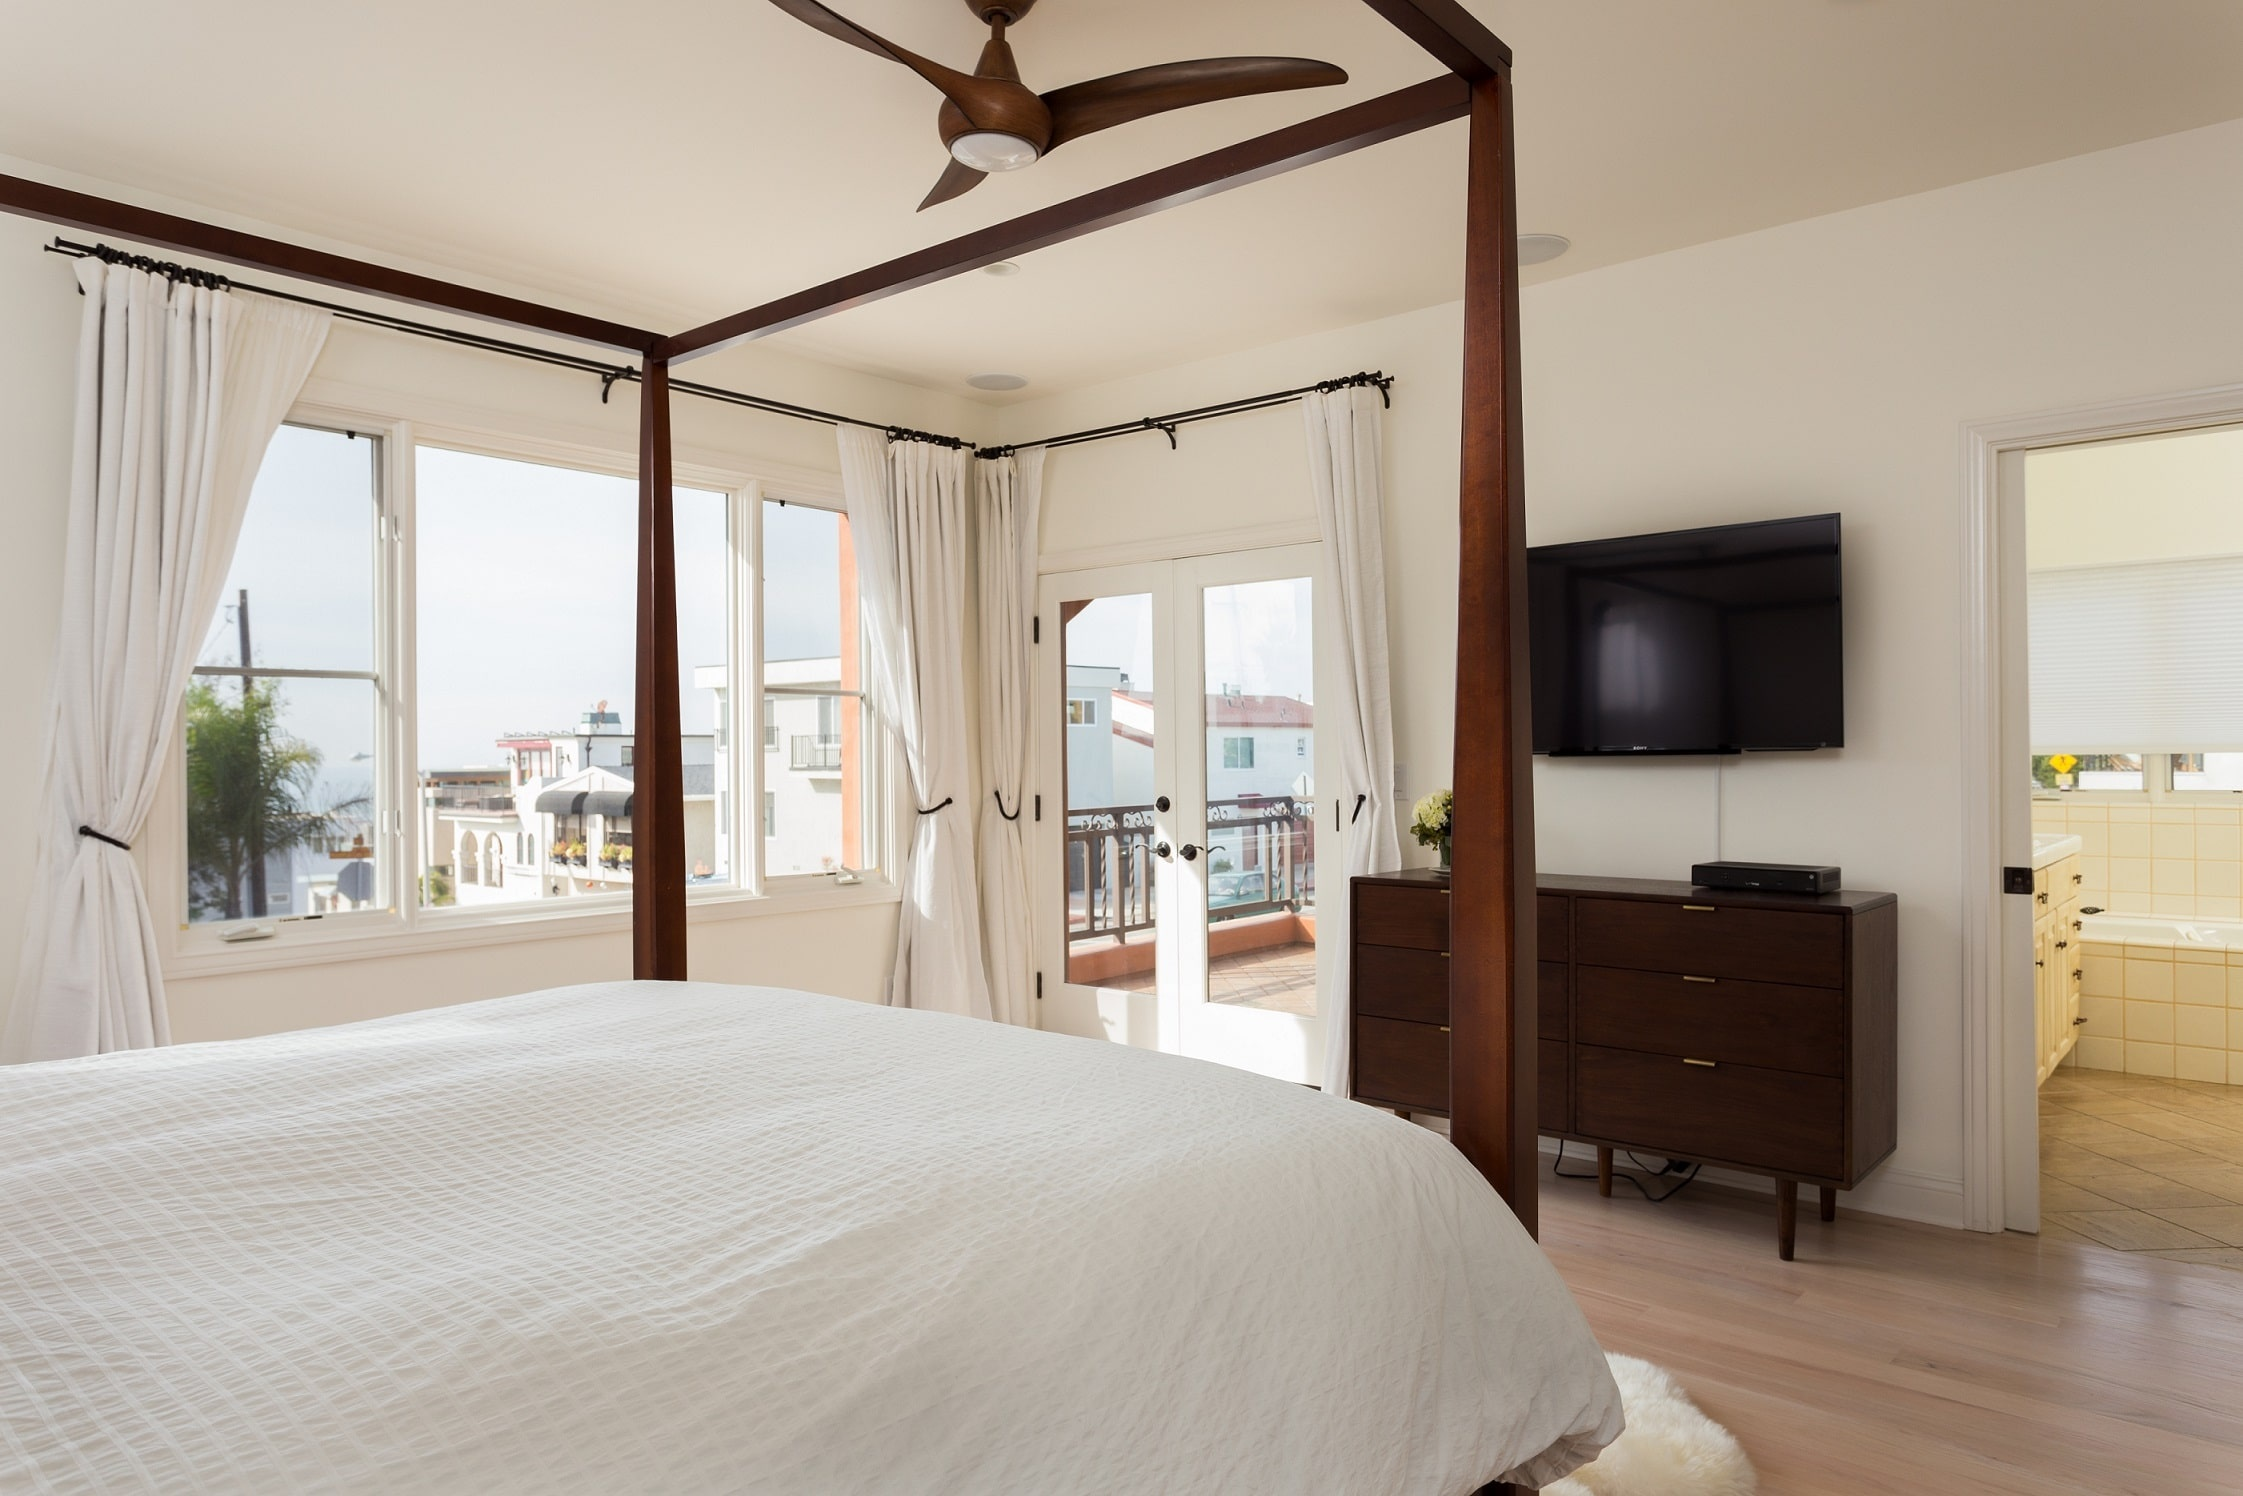 MB Executive Home Bedroom 2